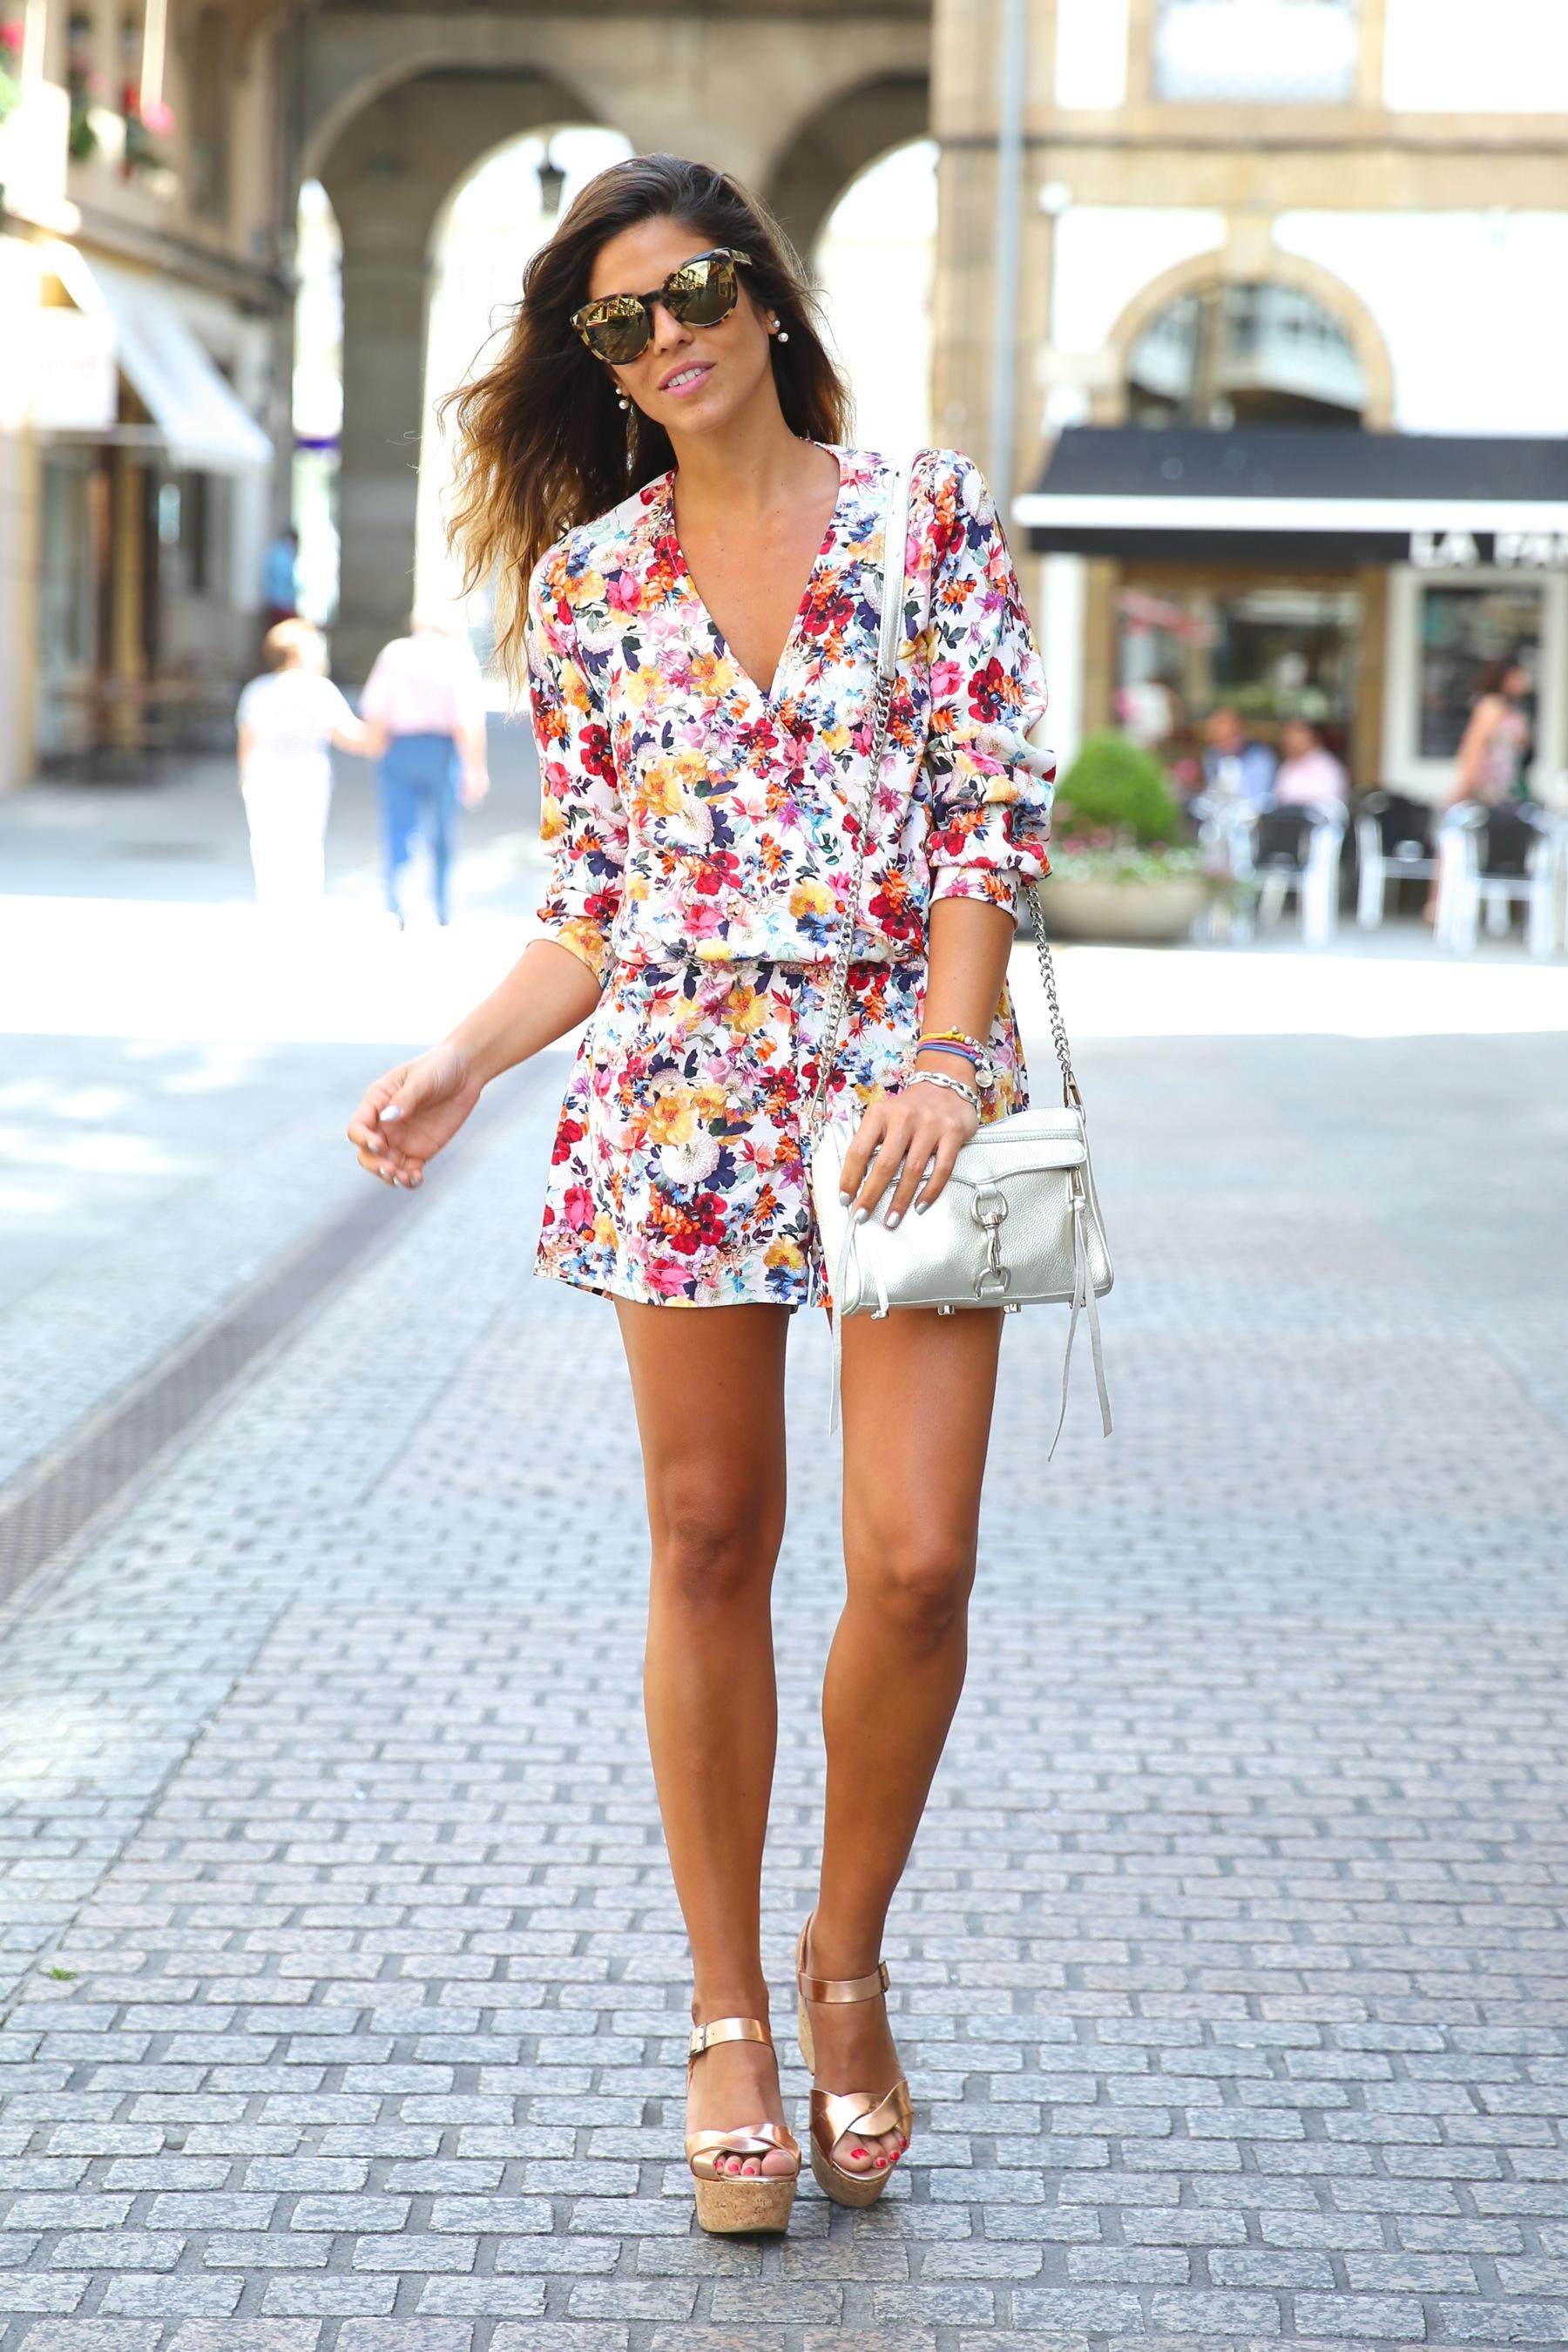 trendy_taste-look-outfit-street_style-ootd-blog-blogger-fashion_spain-moda_españa-mono-flores-flower_print-verano-summer-overall-la_coruña-8